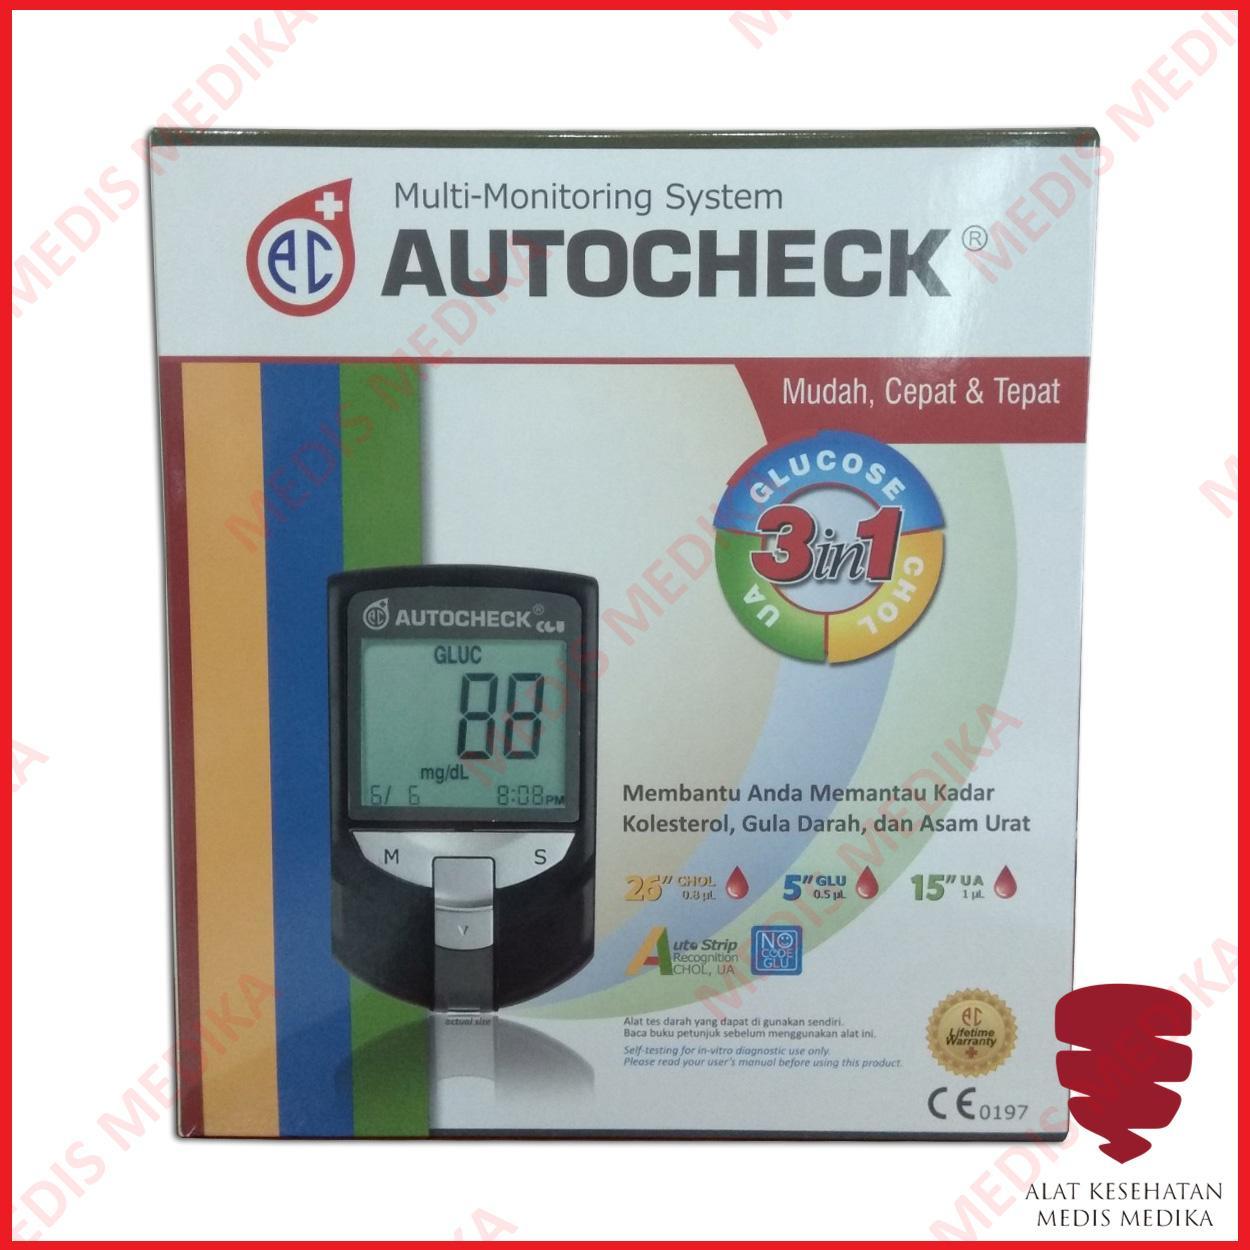 Autocheck 3 in 1 alat Test Glucose Cholesterol Uric Acid GCU